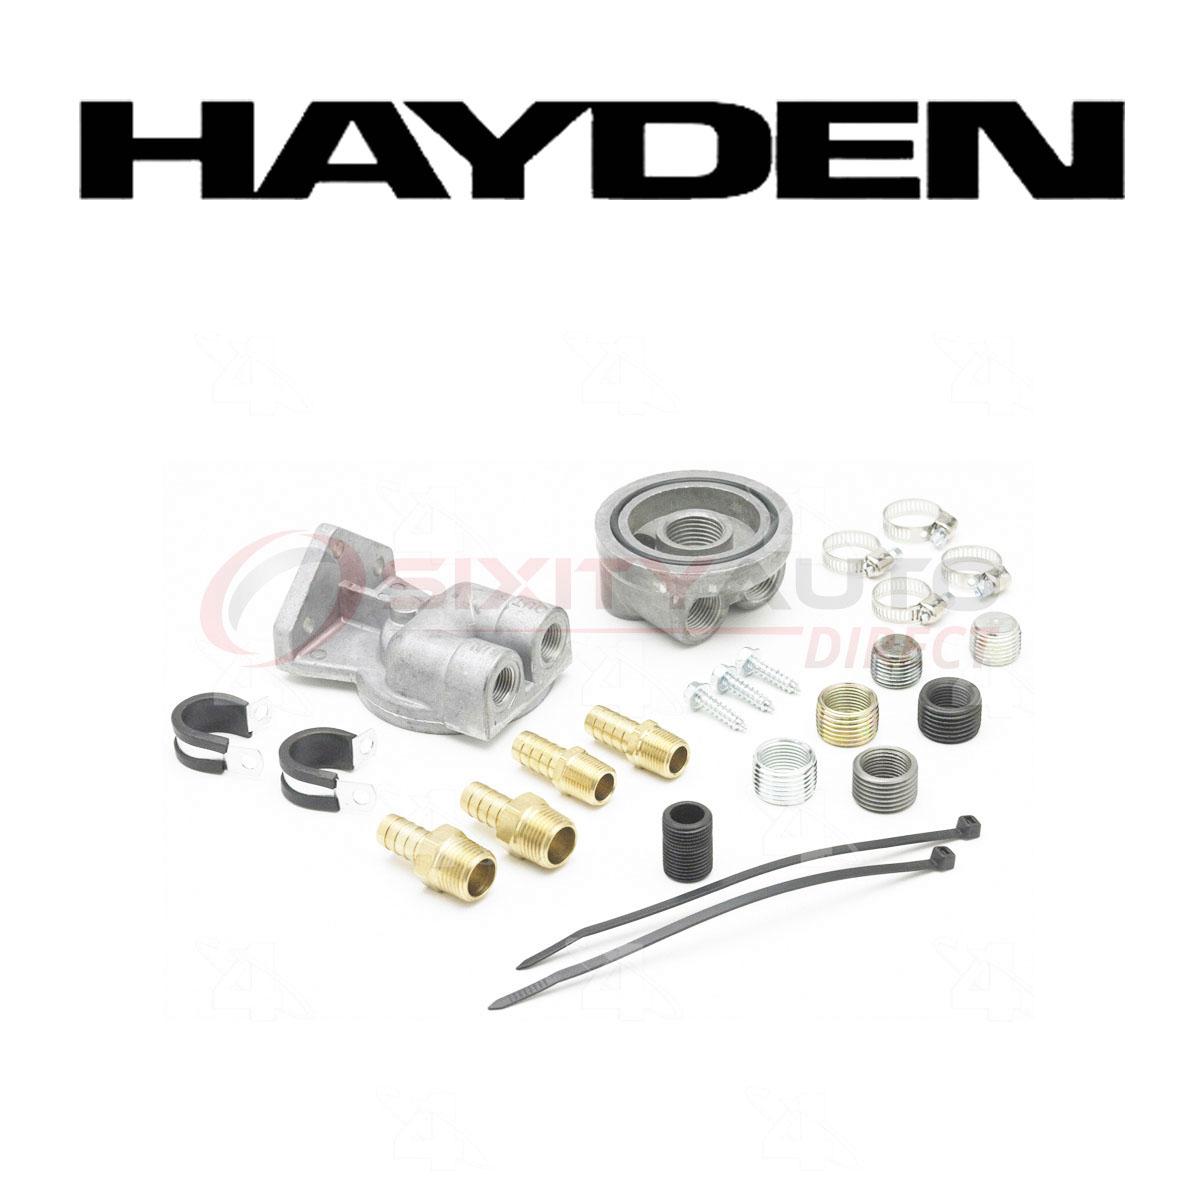 Hayden Oil Filter Remote Mounting Kit for 1991-2011 Honda